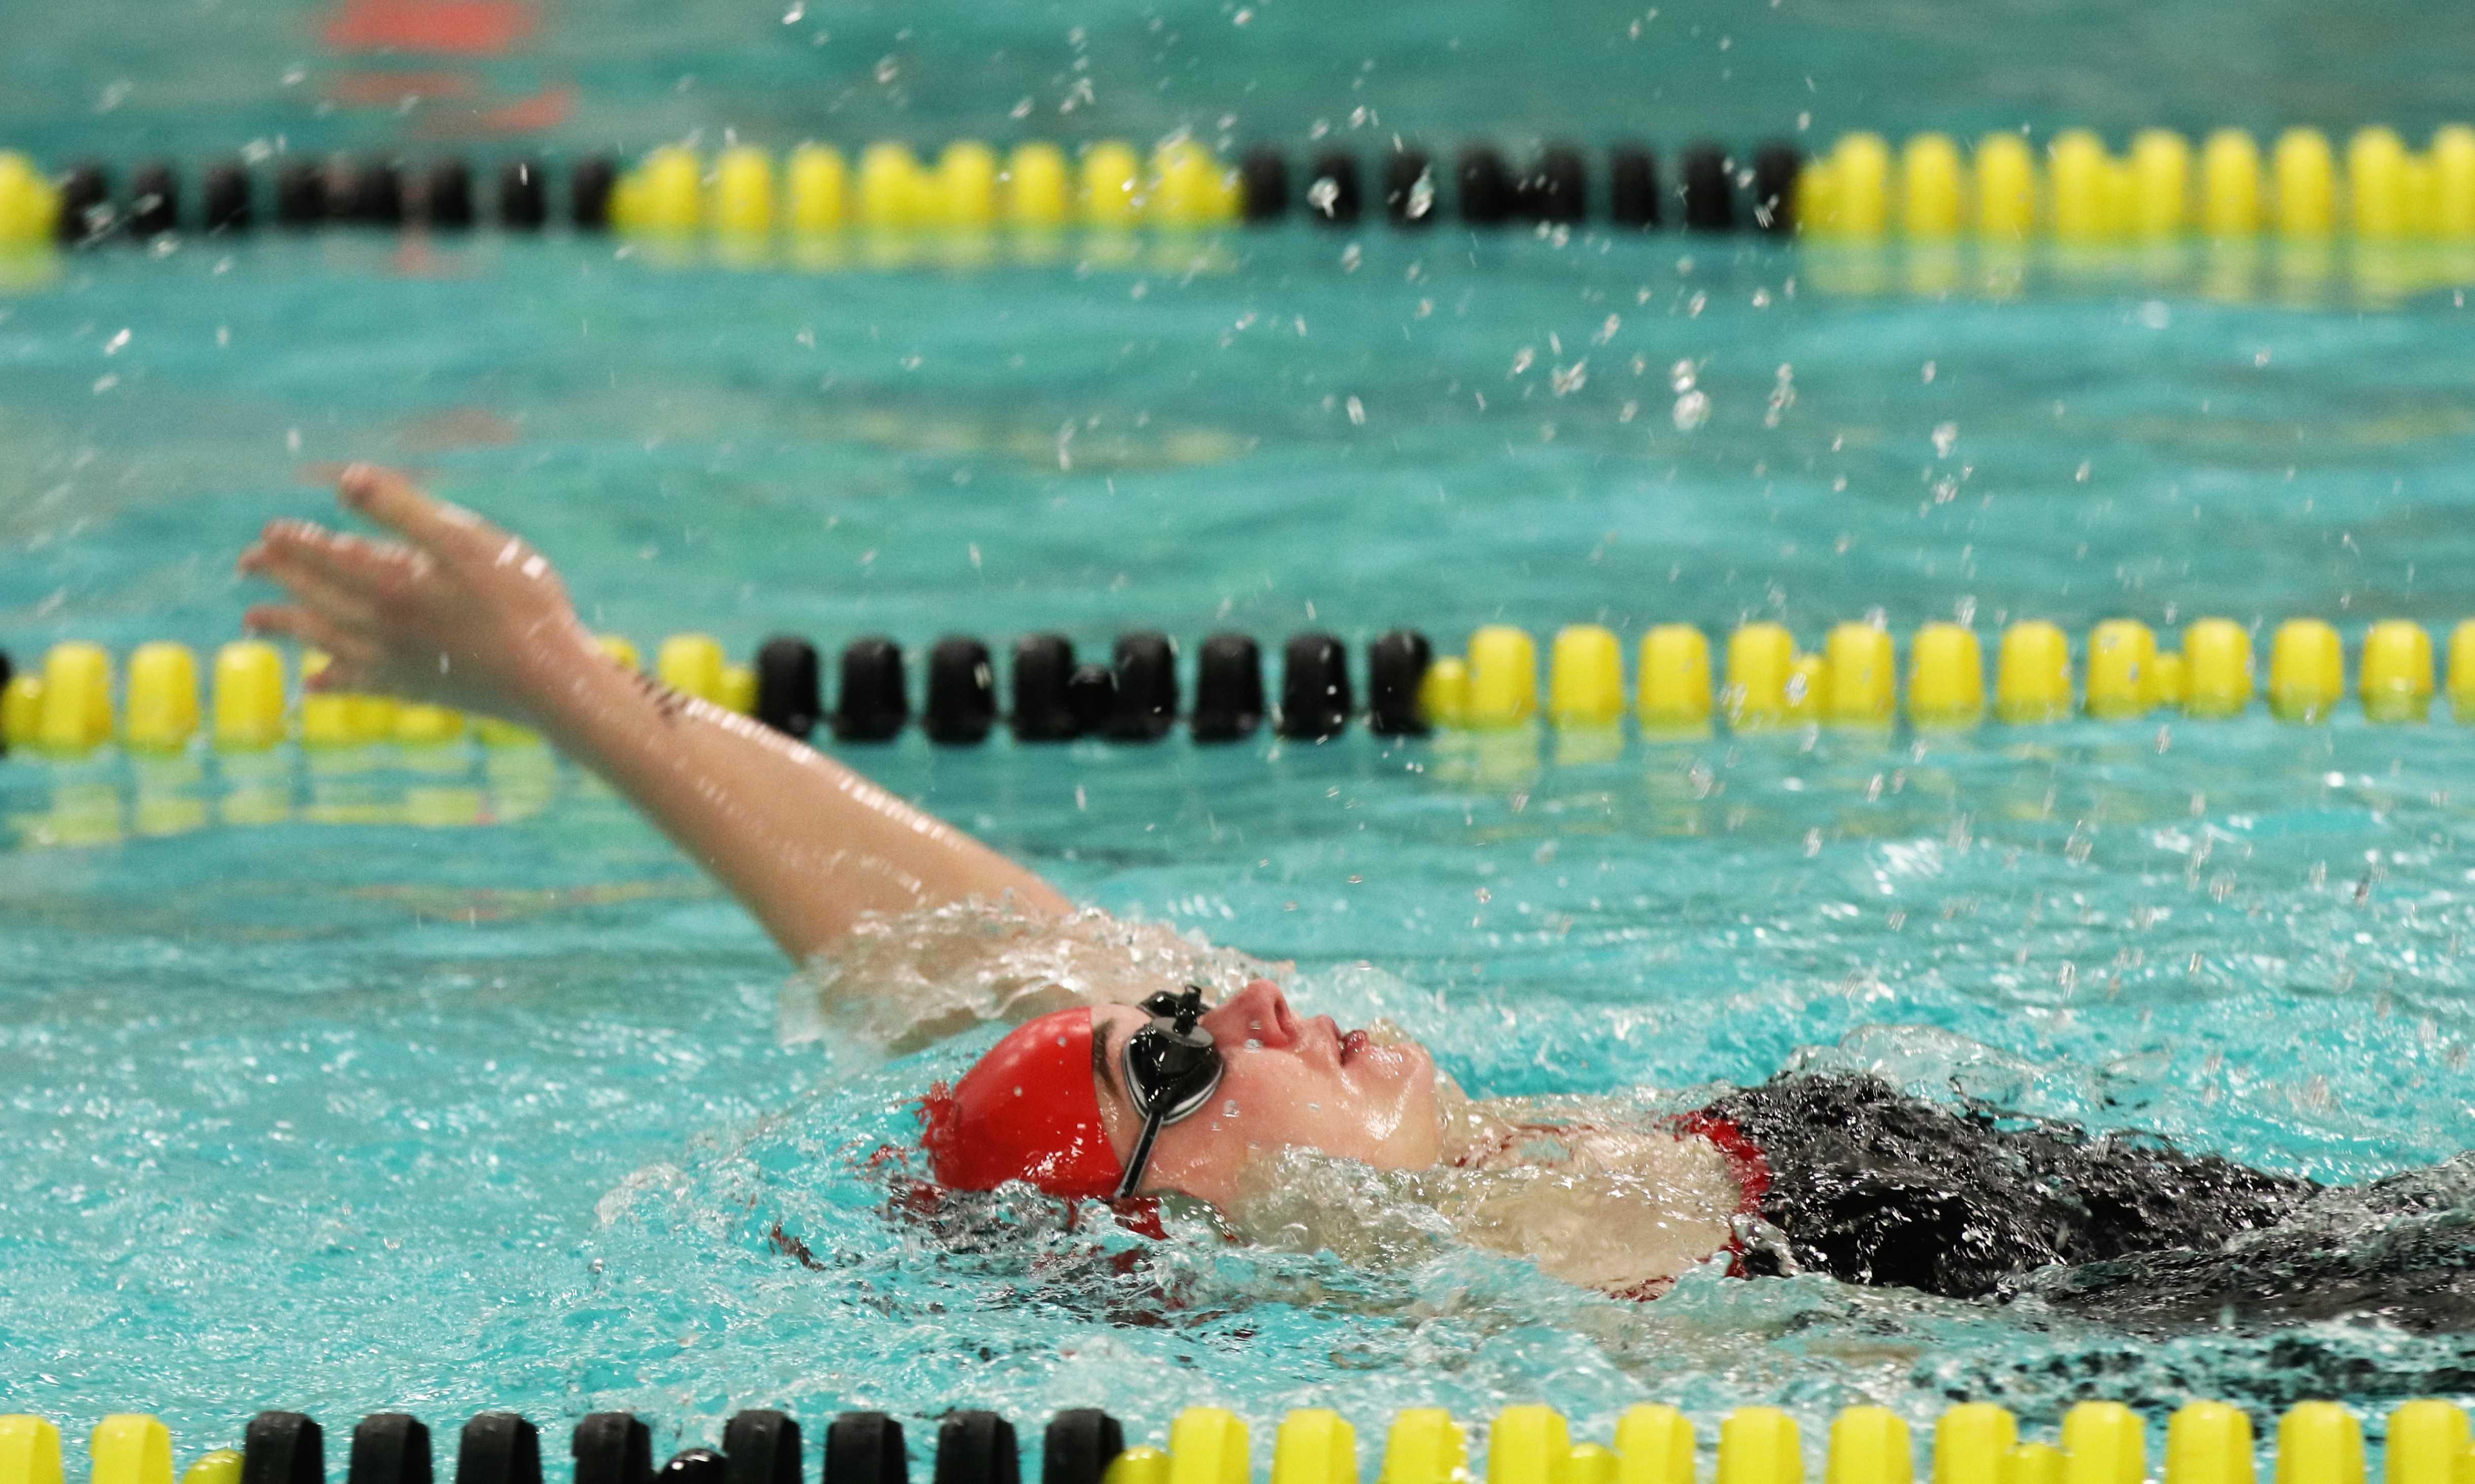 Caroline Henry (11, HSU) swims the backstroke with ease. Photo by Grace Bradley.